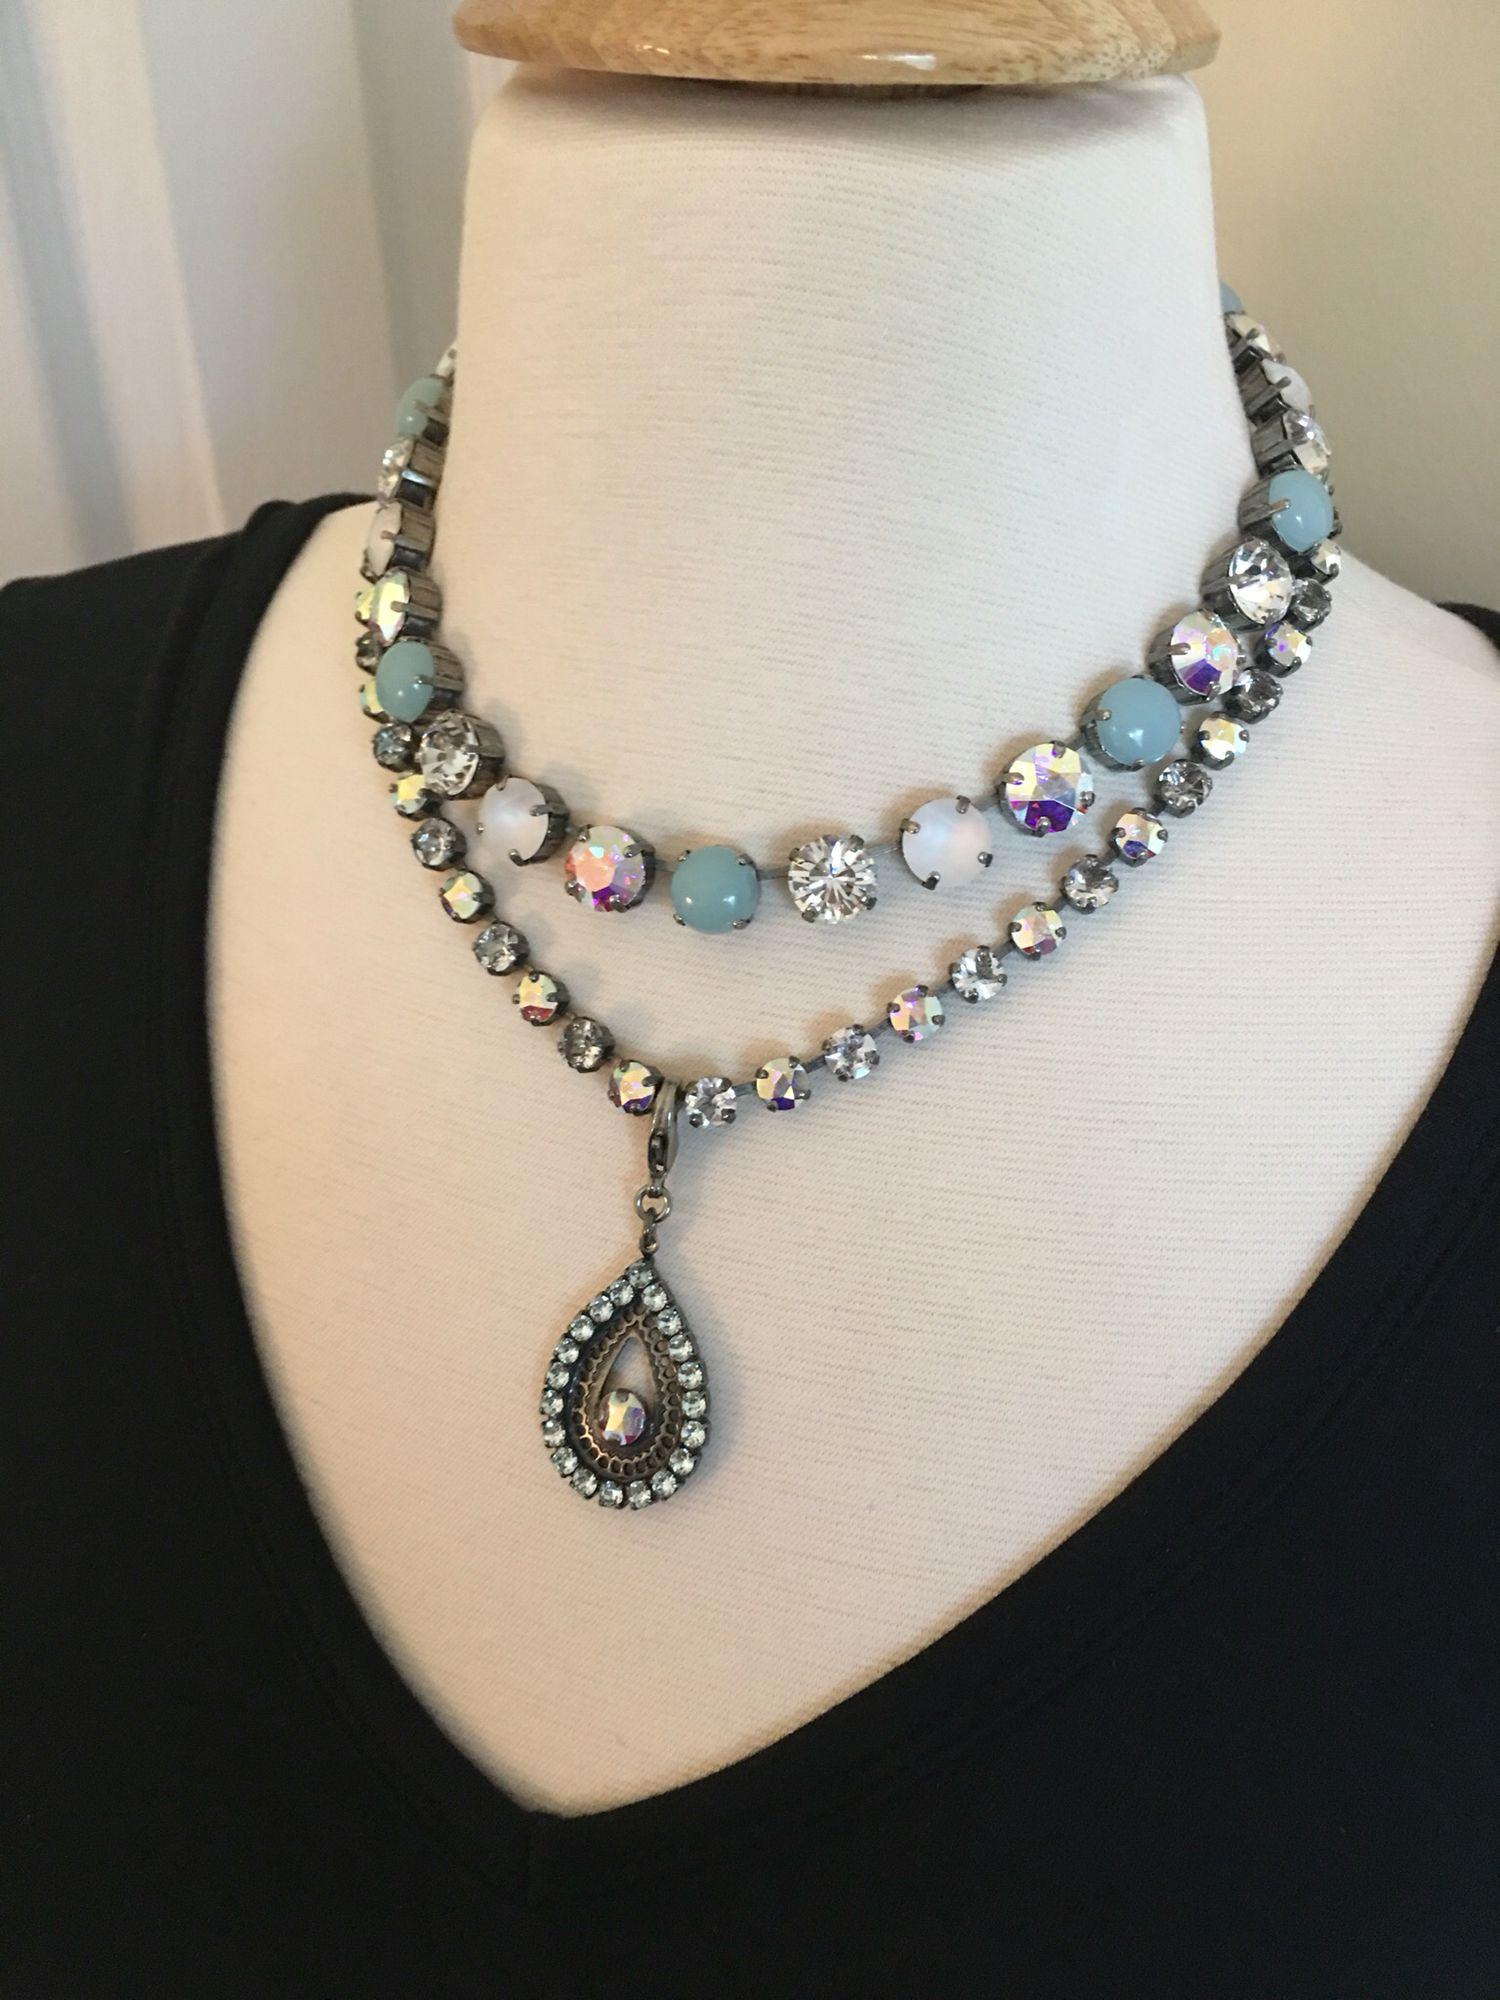 Sabika look necklace - Sabika Winter 16 Collection Www Sabika Jewelry Com Donnarossi